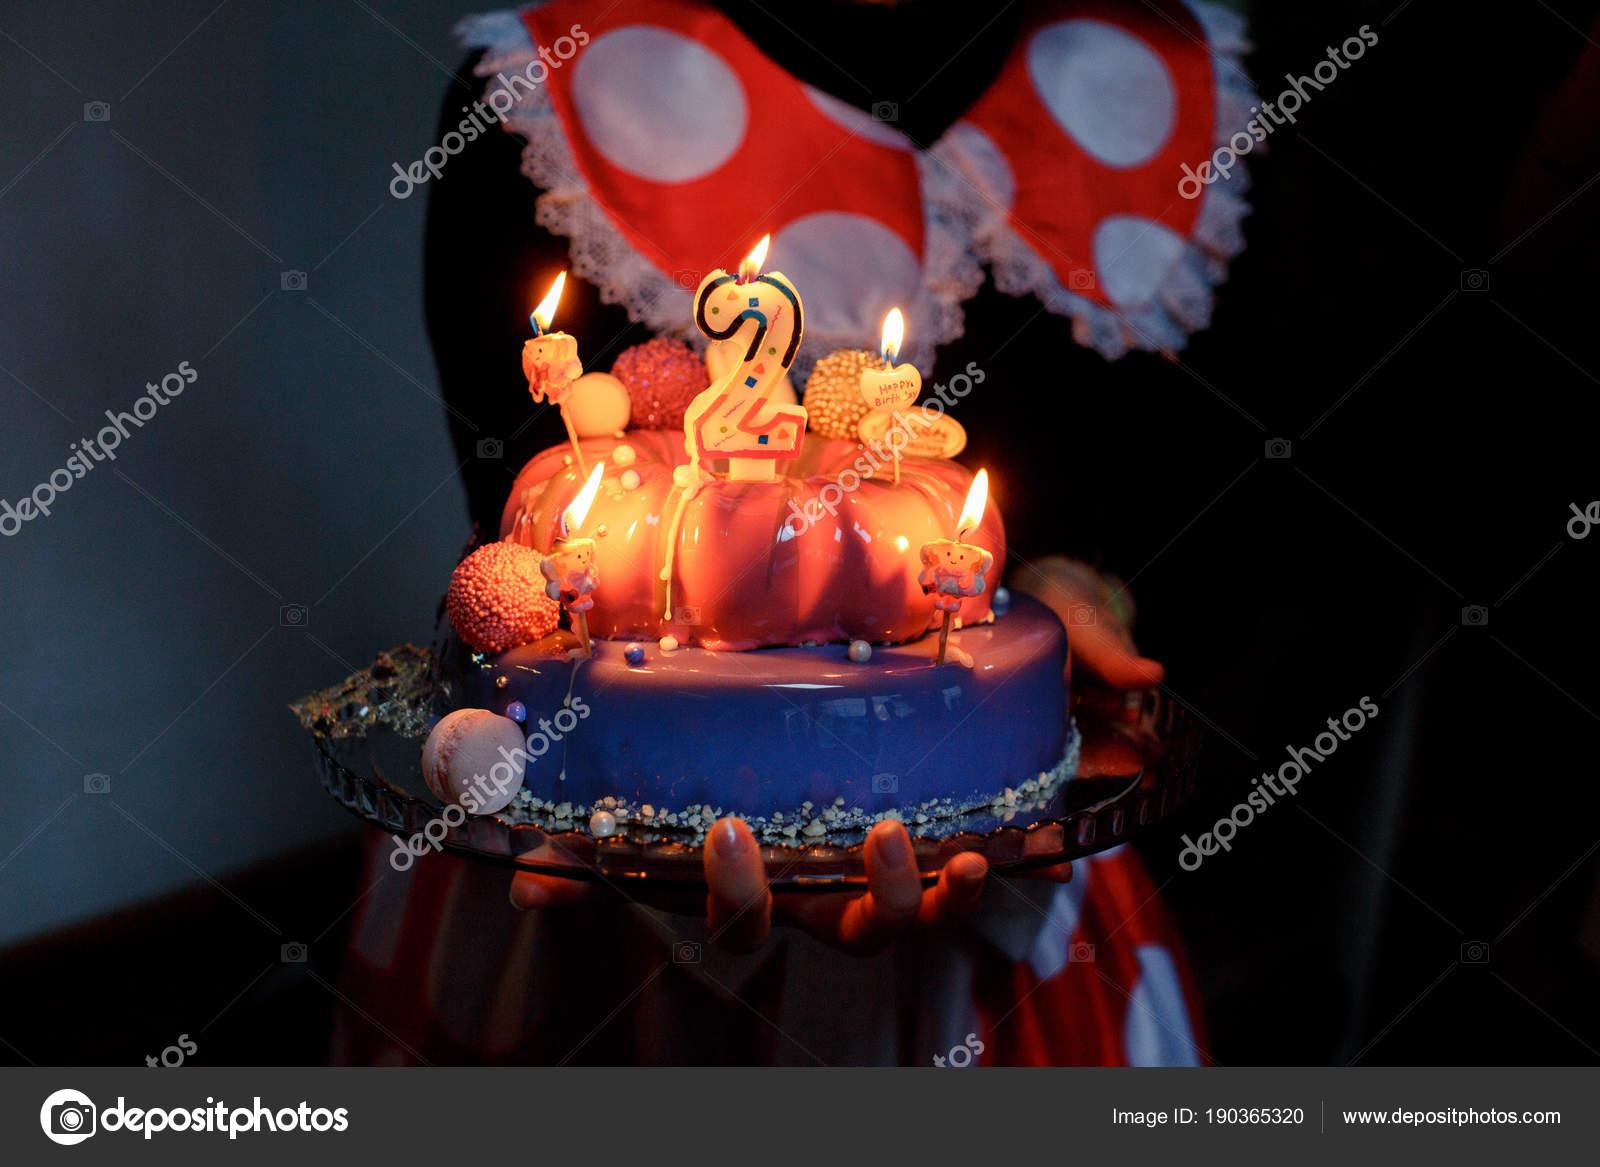 Happy Birthday Cake Candles Stock Photo Vaksmanv101 190365320